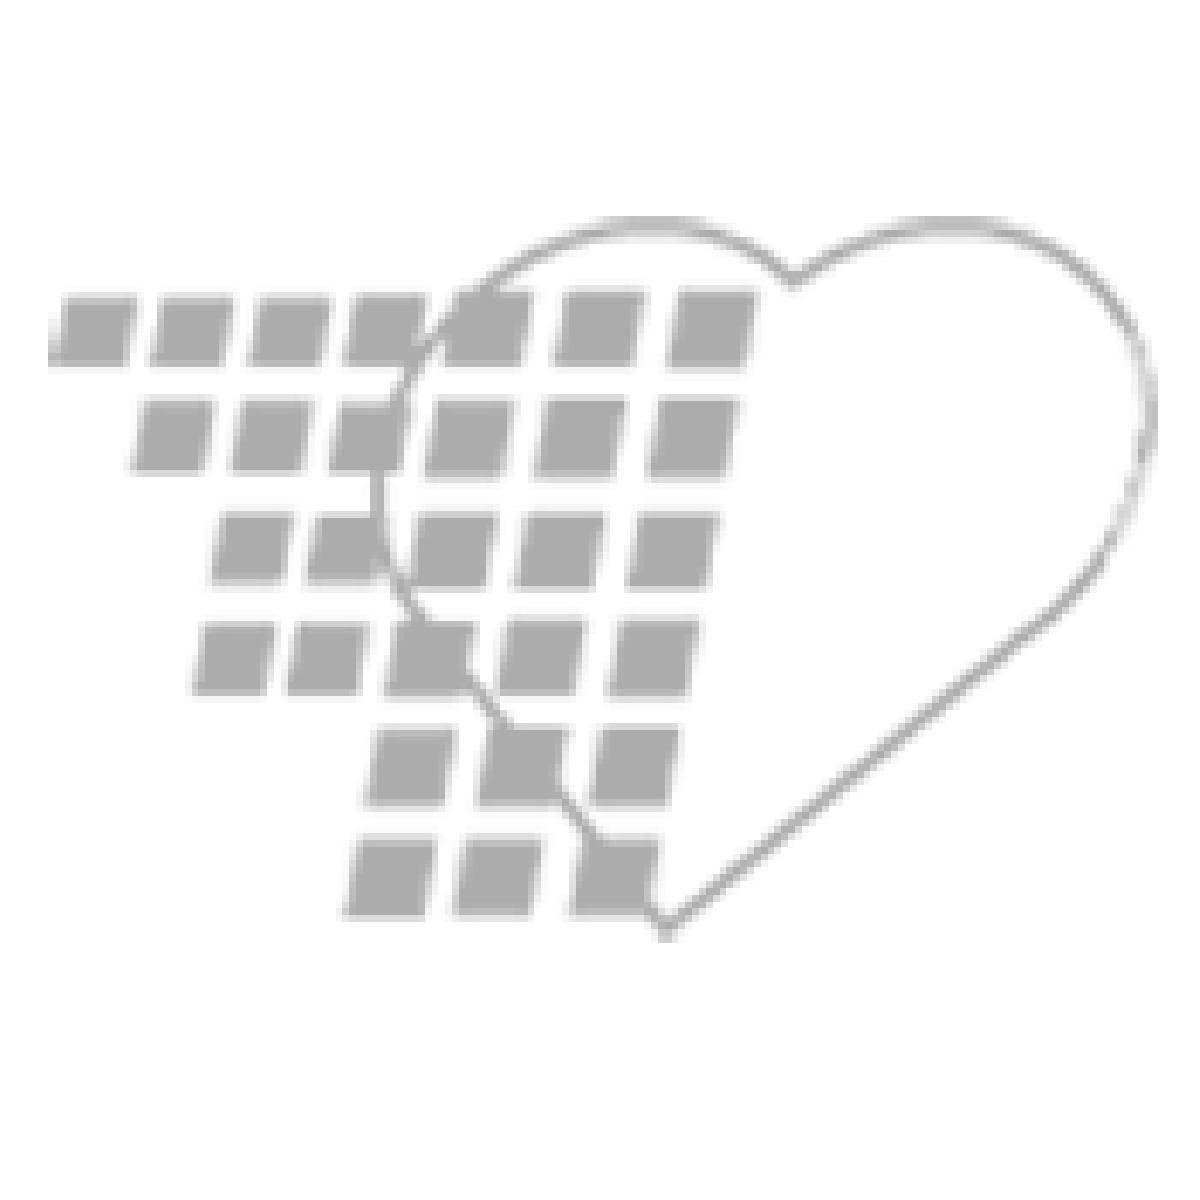 06-93-8001 Demo Dose® Cyclophosphamid  Cytoxn 1g 50mL  50mL